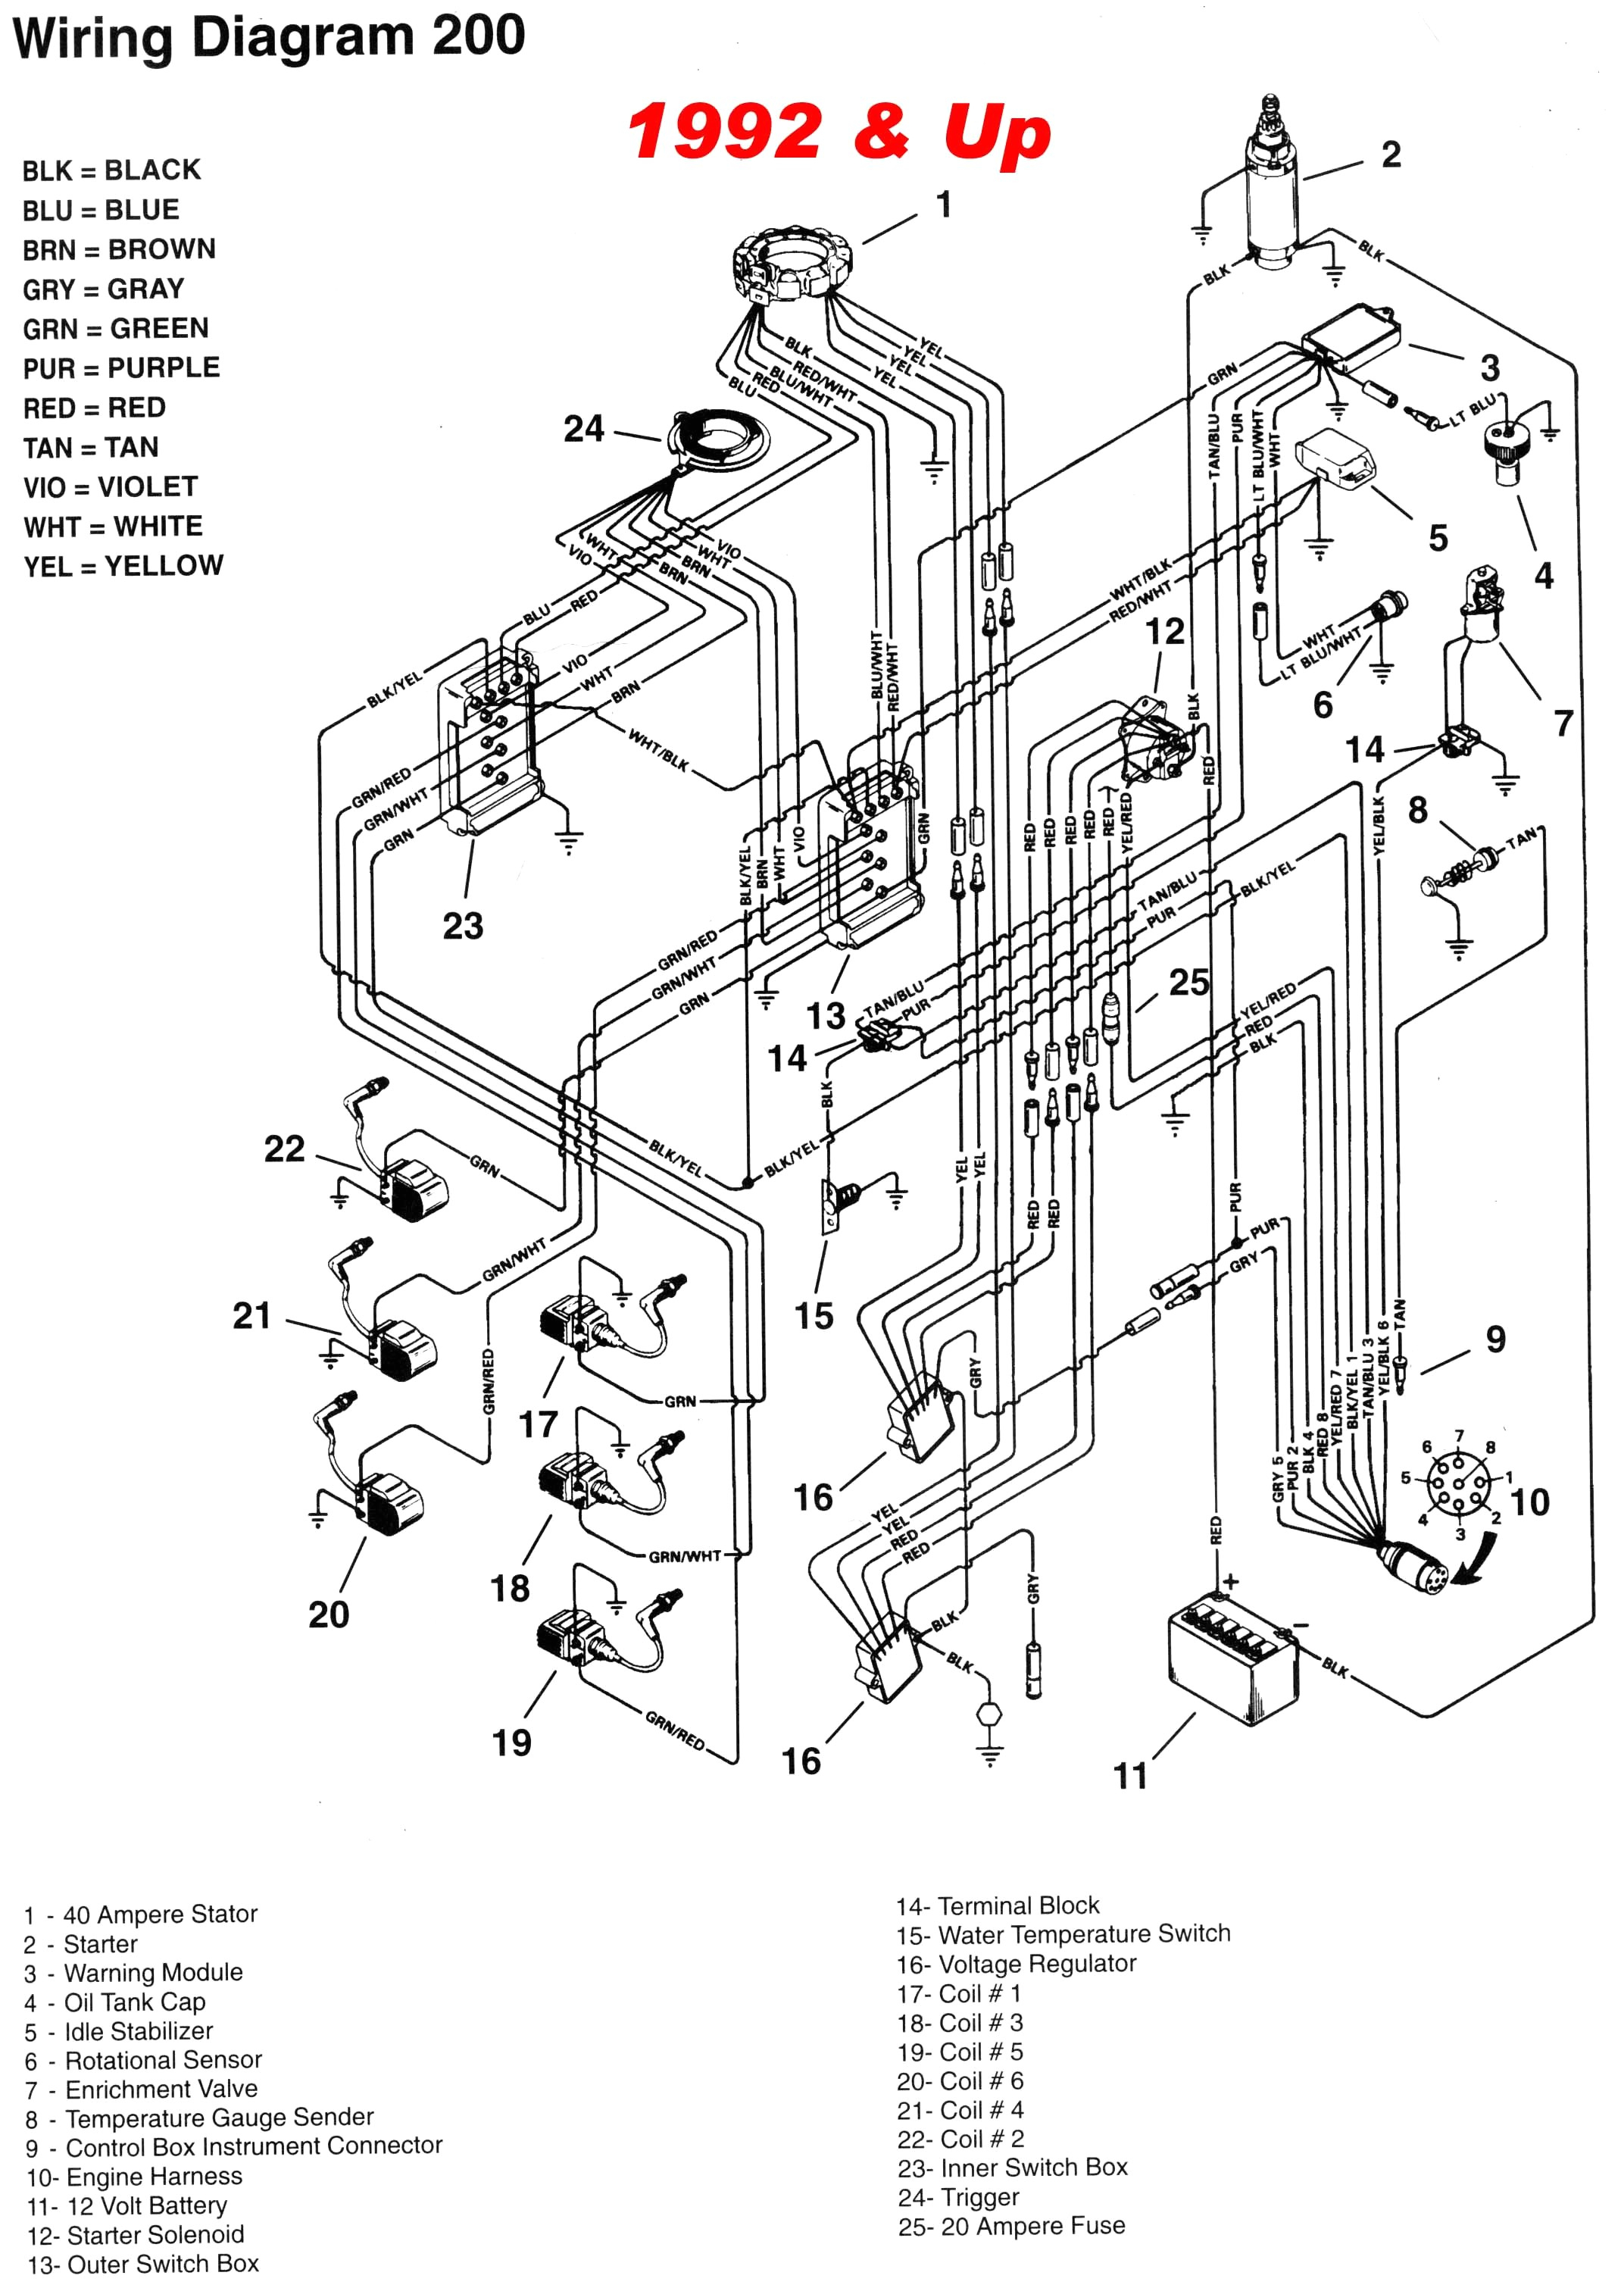 wiring diagram on 4 hp mercury outboard motor 2 stroke diagram mercury outboard 115 hp 2